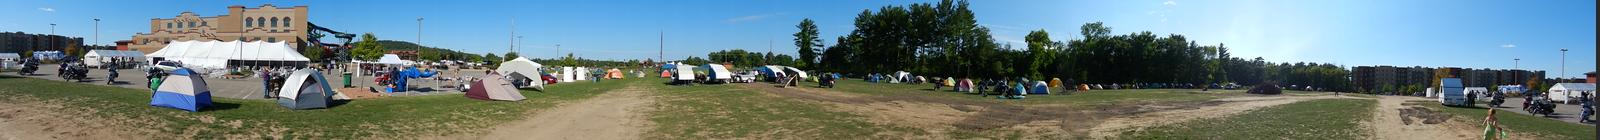 Dells Rally '11